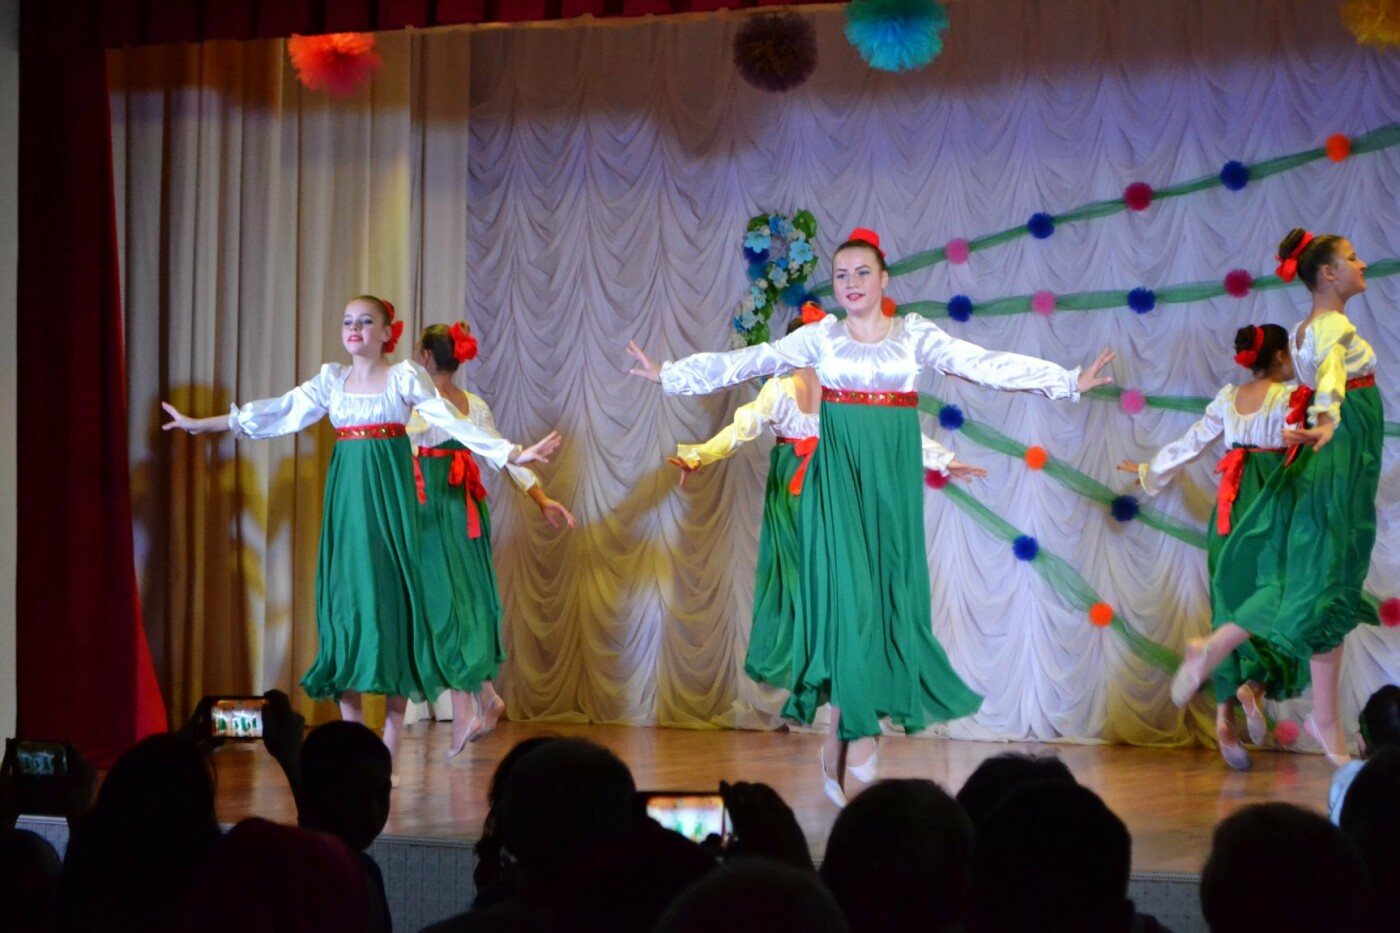 В селе Малодолинское поздравили женщин с 8 Марта, фото-3